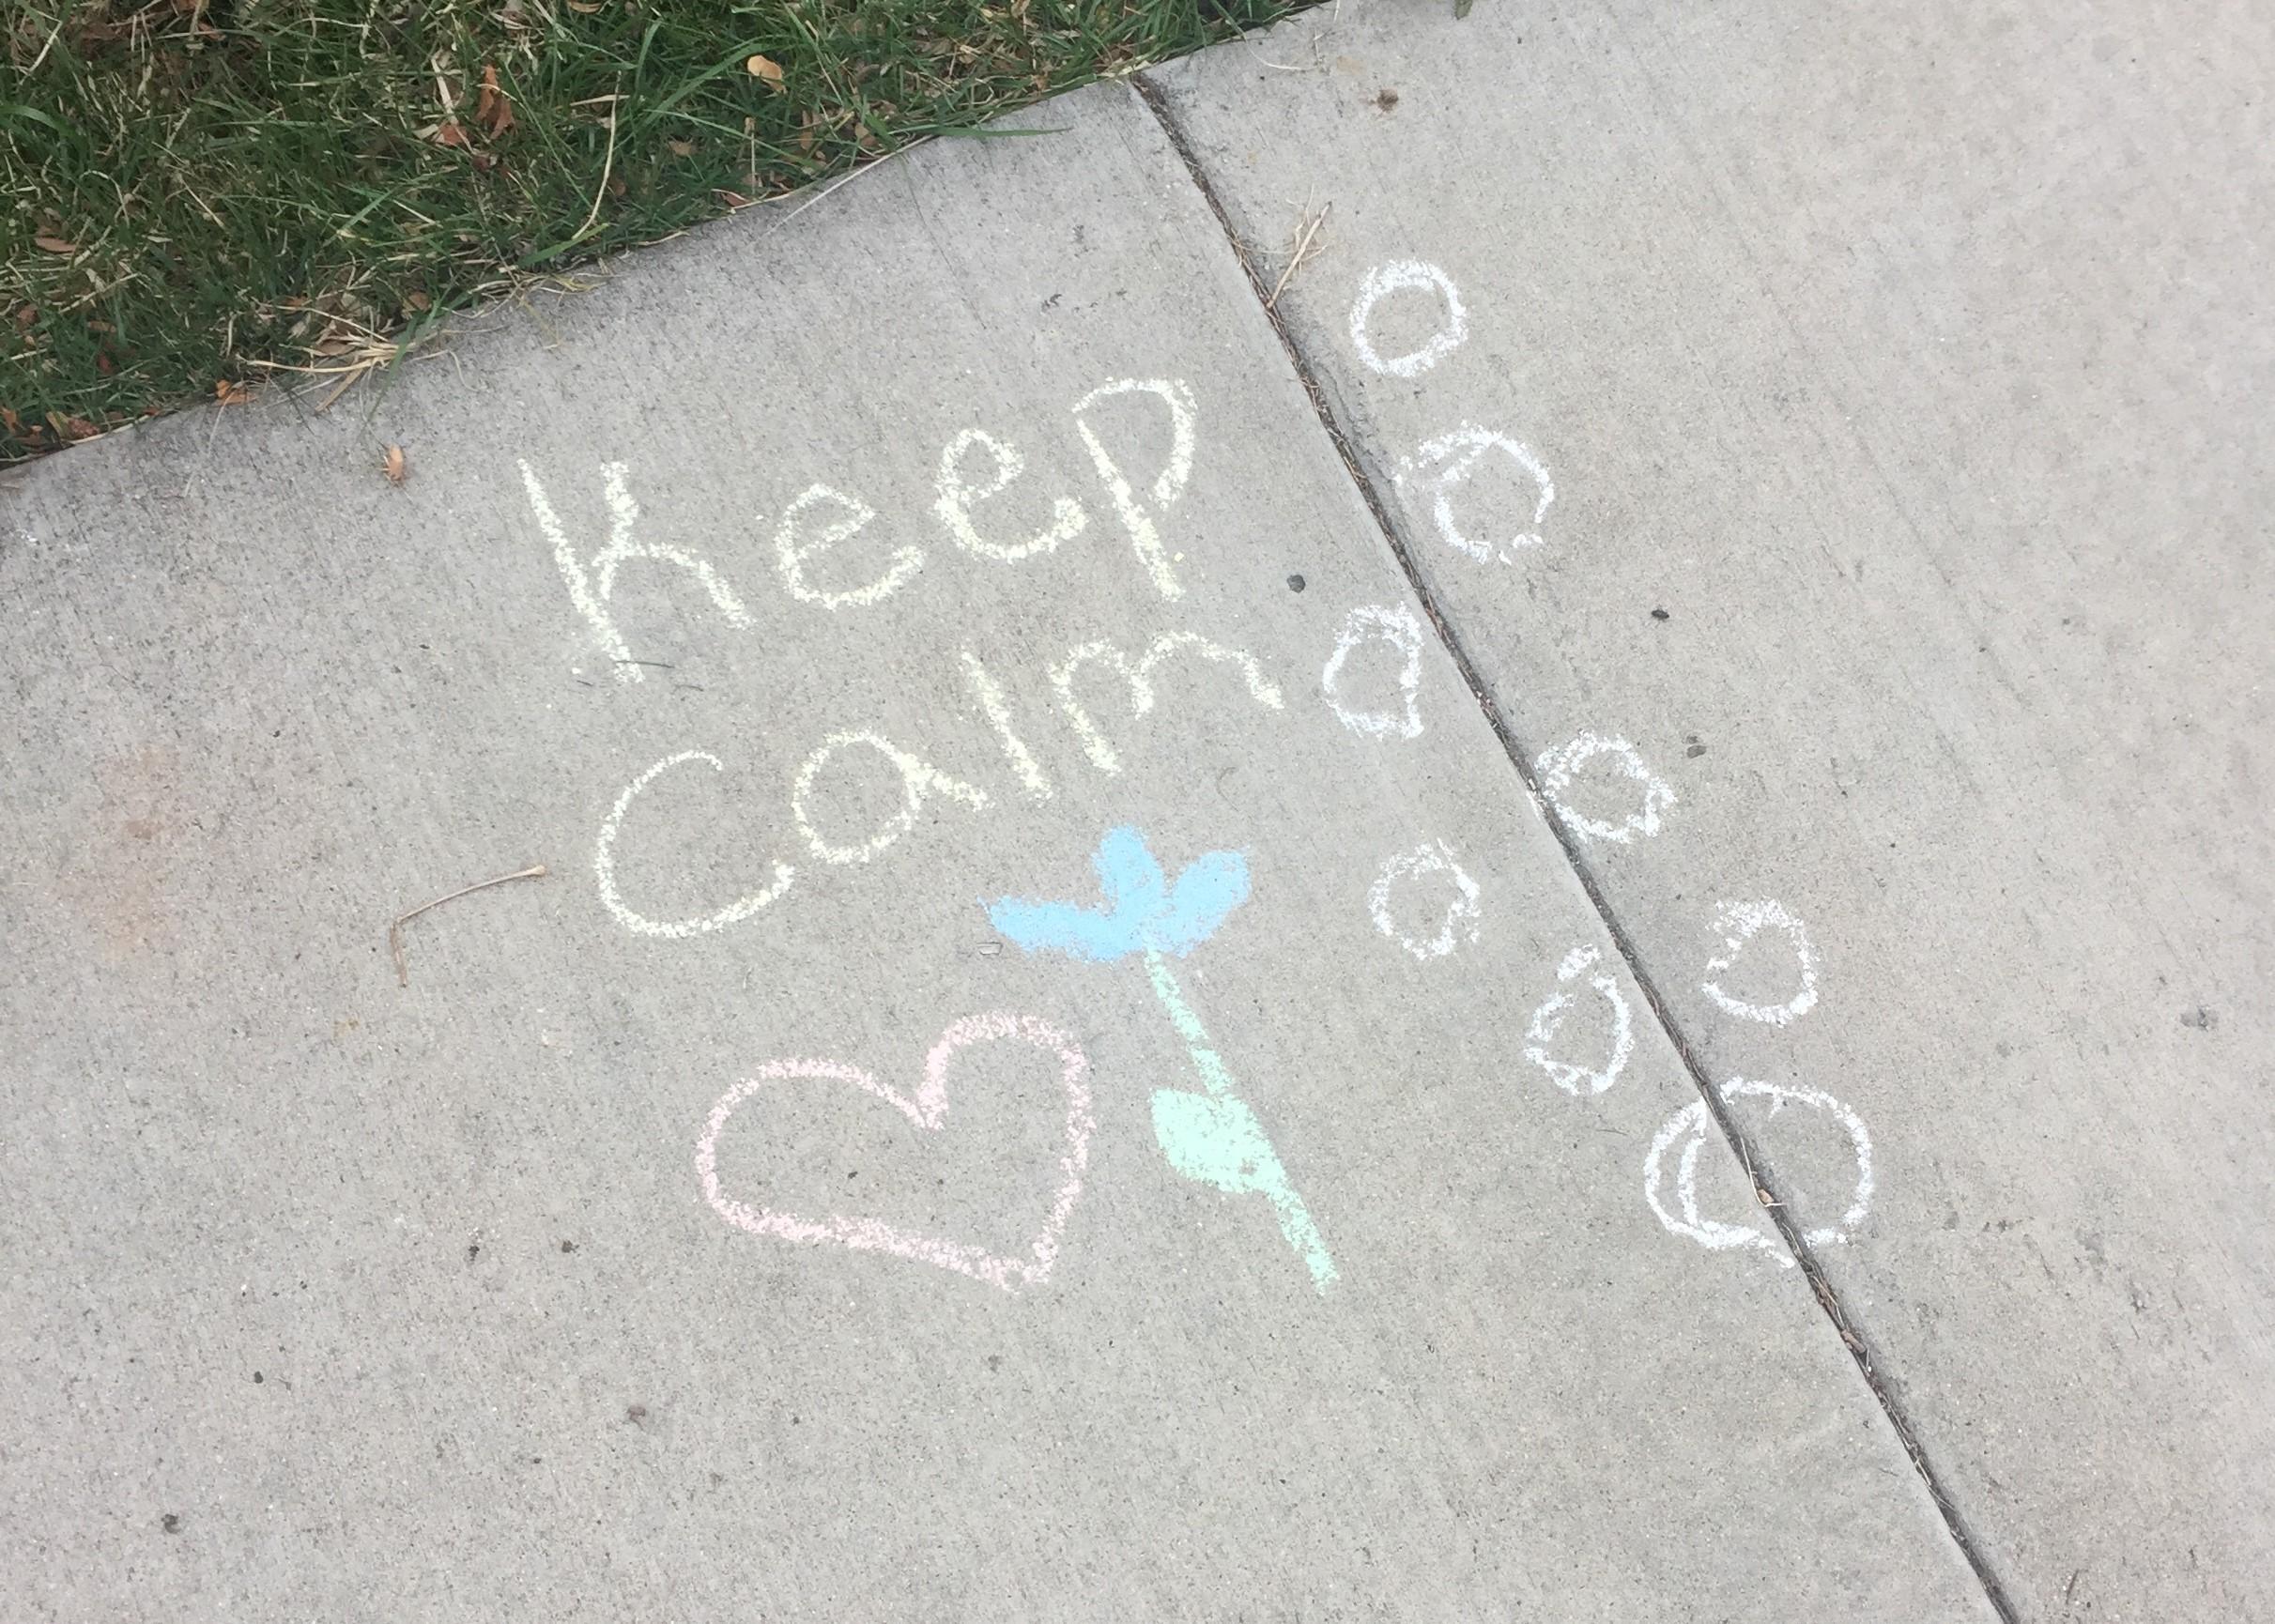 keep-calm-written-in-sidewalk-chalk-with-pink-heart-and-blue-flower